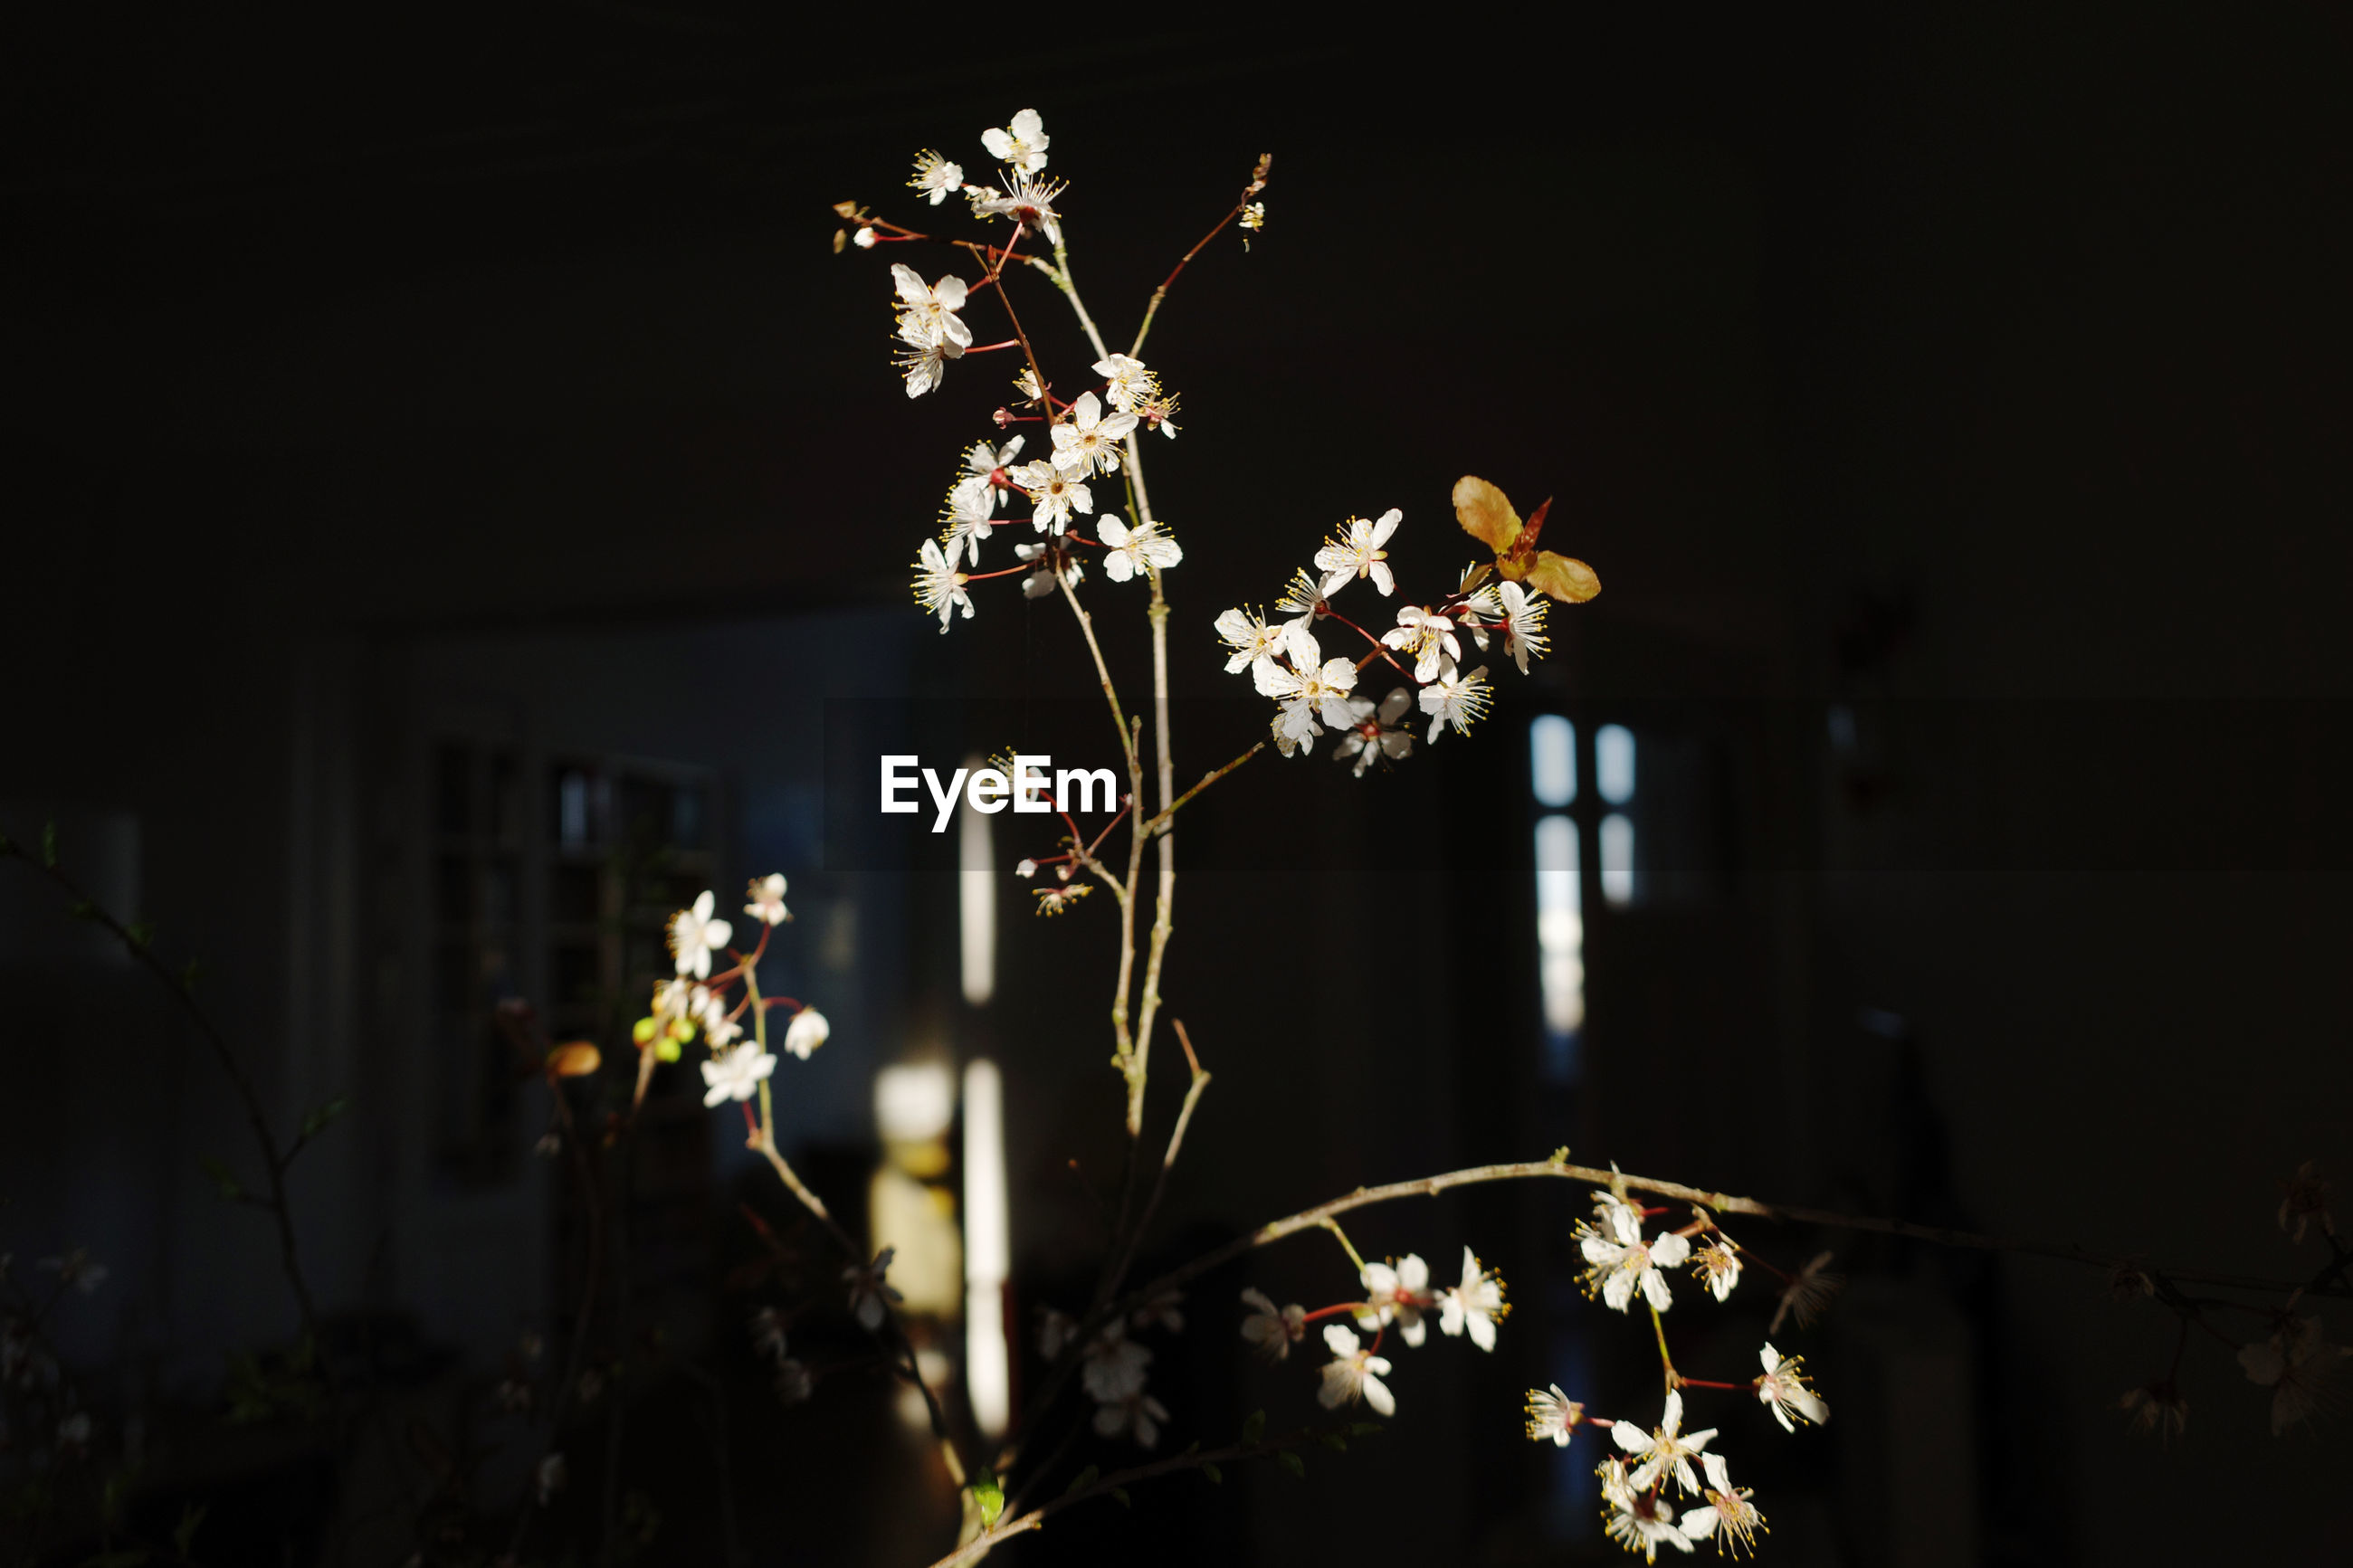 CLOSE-UP OF WHITE FLOWERING PLANTS AT NIGHT DURING RAINY SEASON